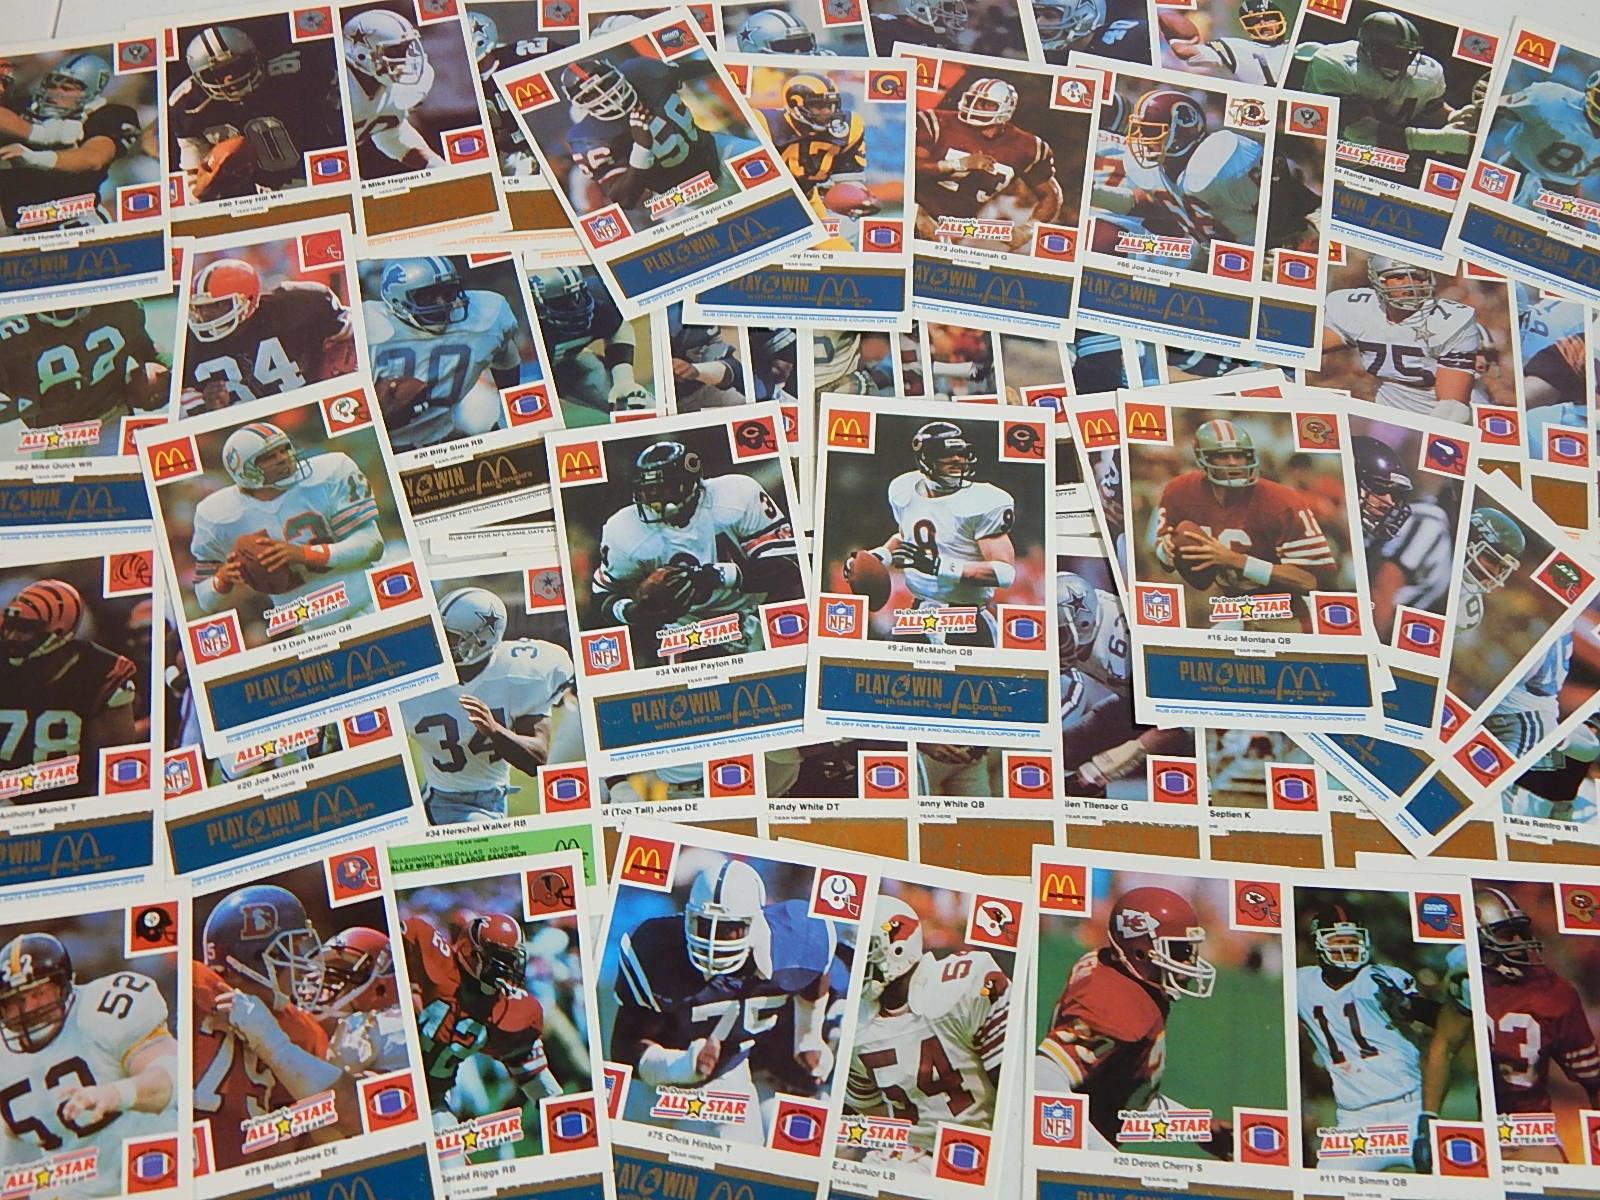 1986 McDonalds All-Star Team and Team Football Cards - Marino, Montana, Payton